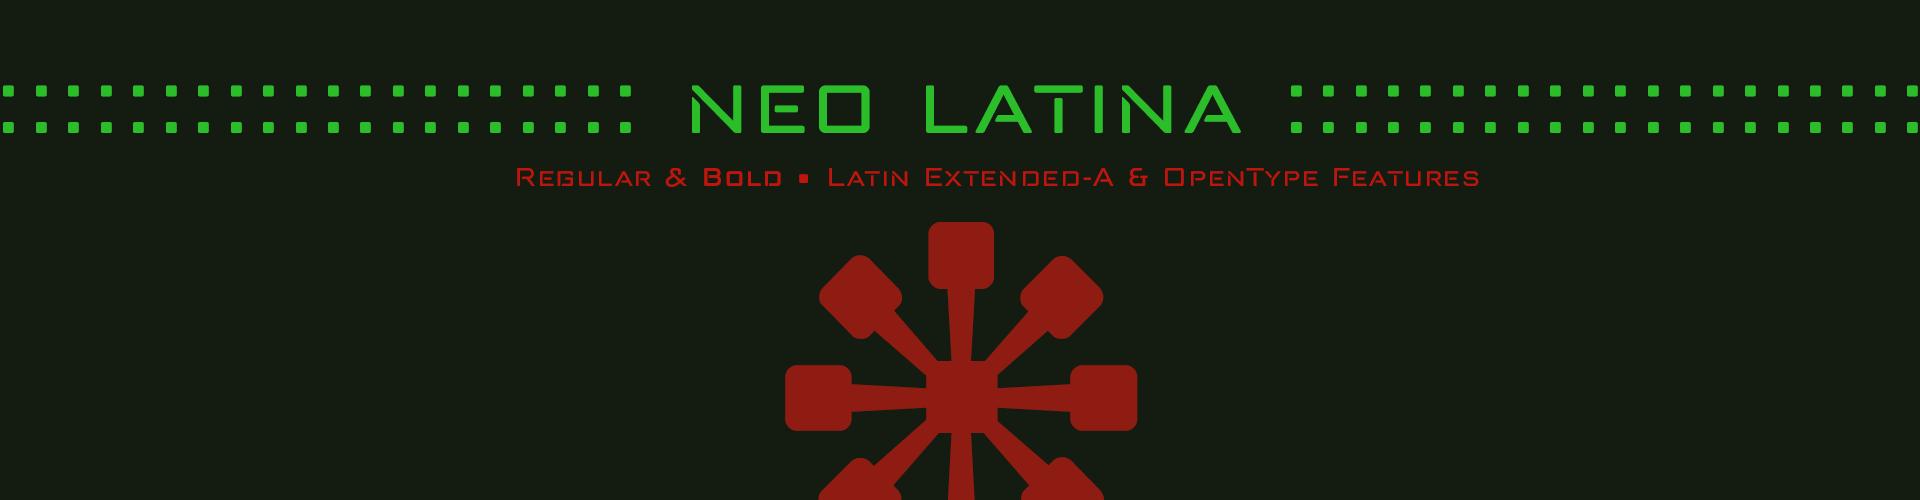 Neo Latina - Futurist Fonts